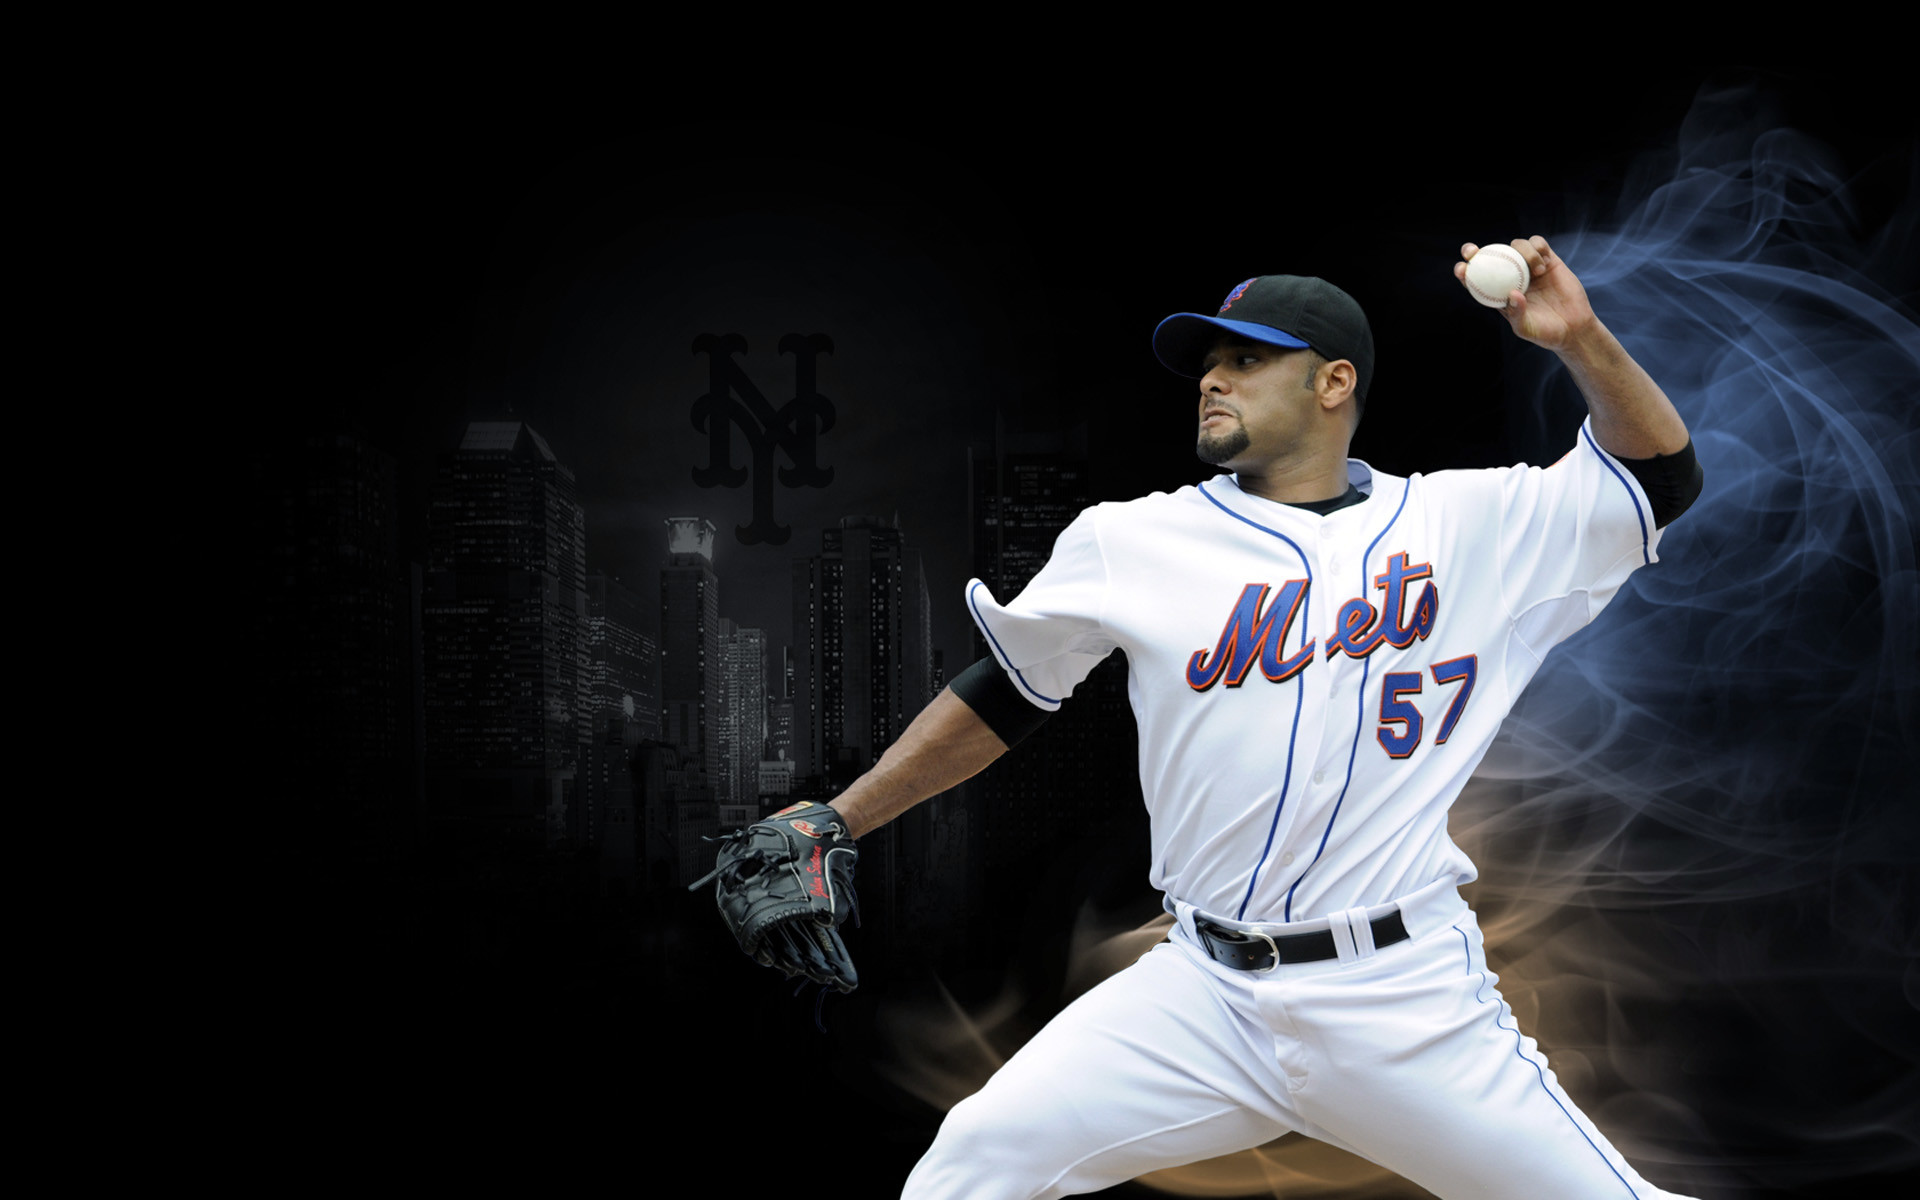 Johan Santana with the New York Mets wallpaper